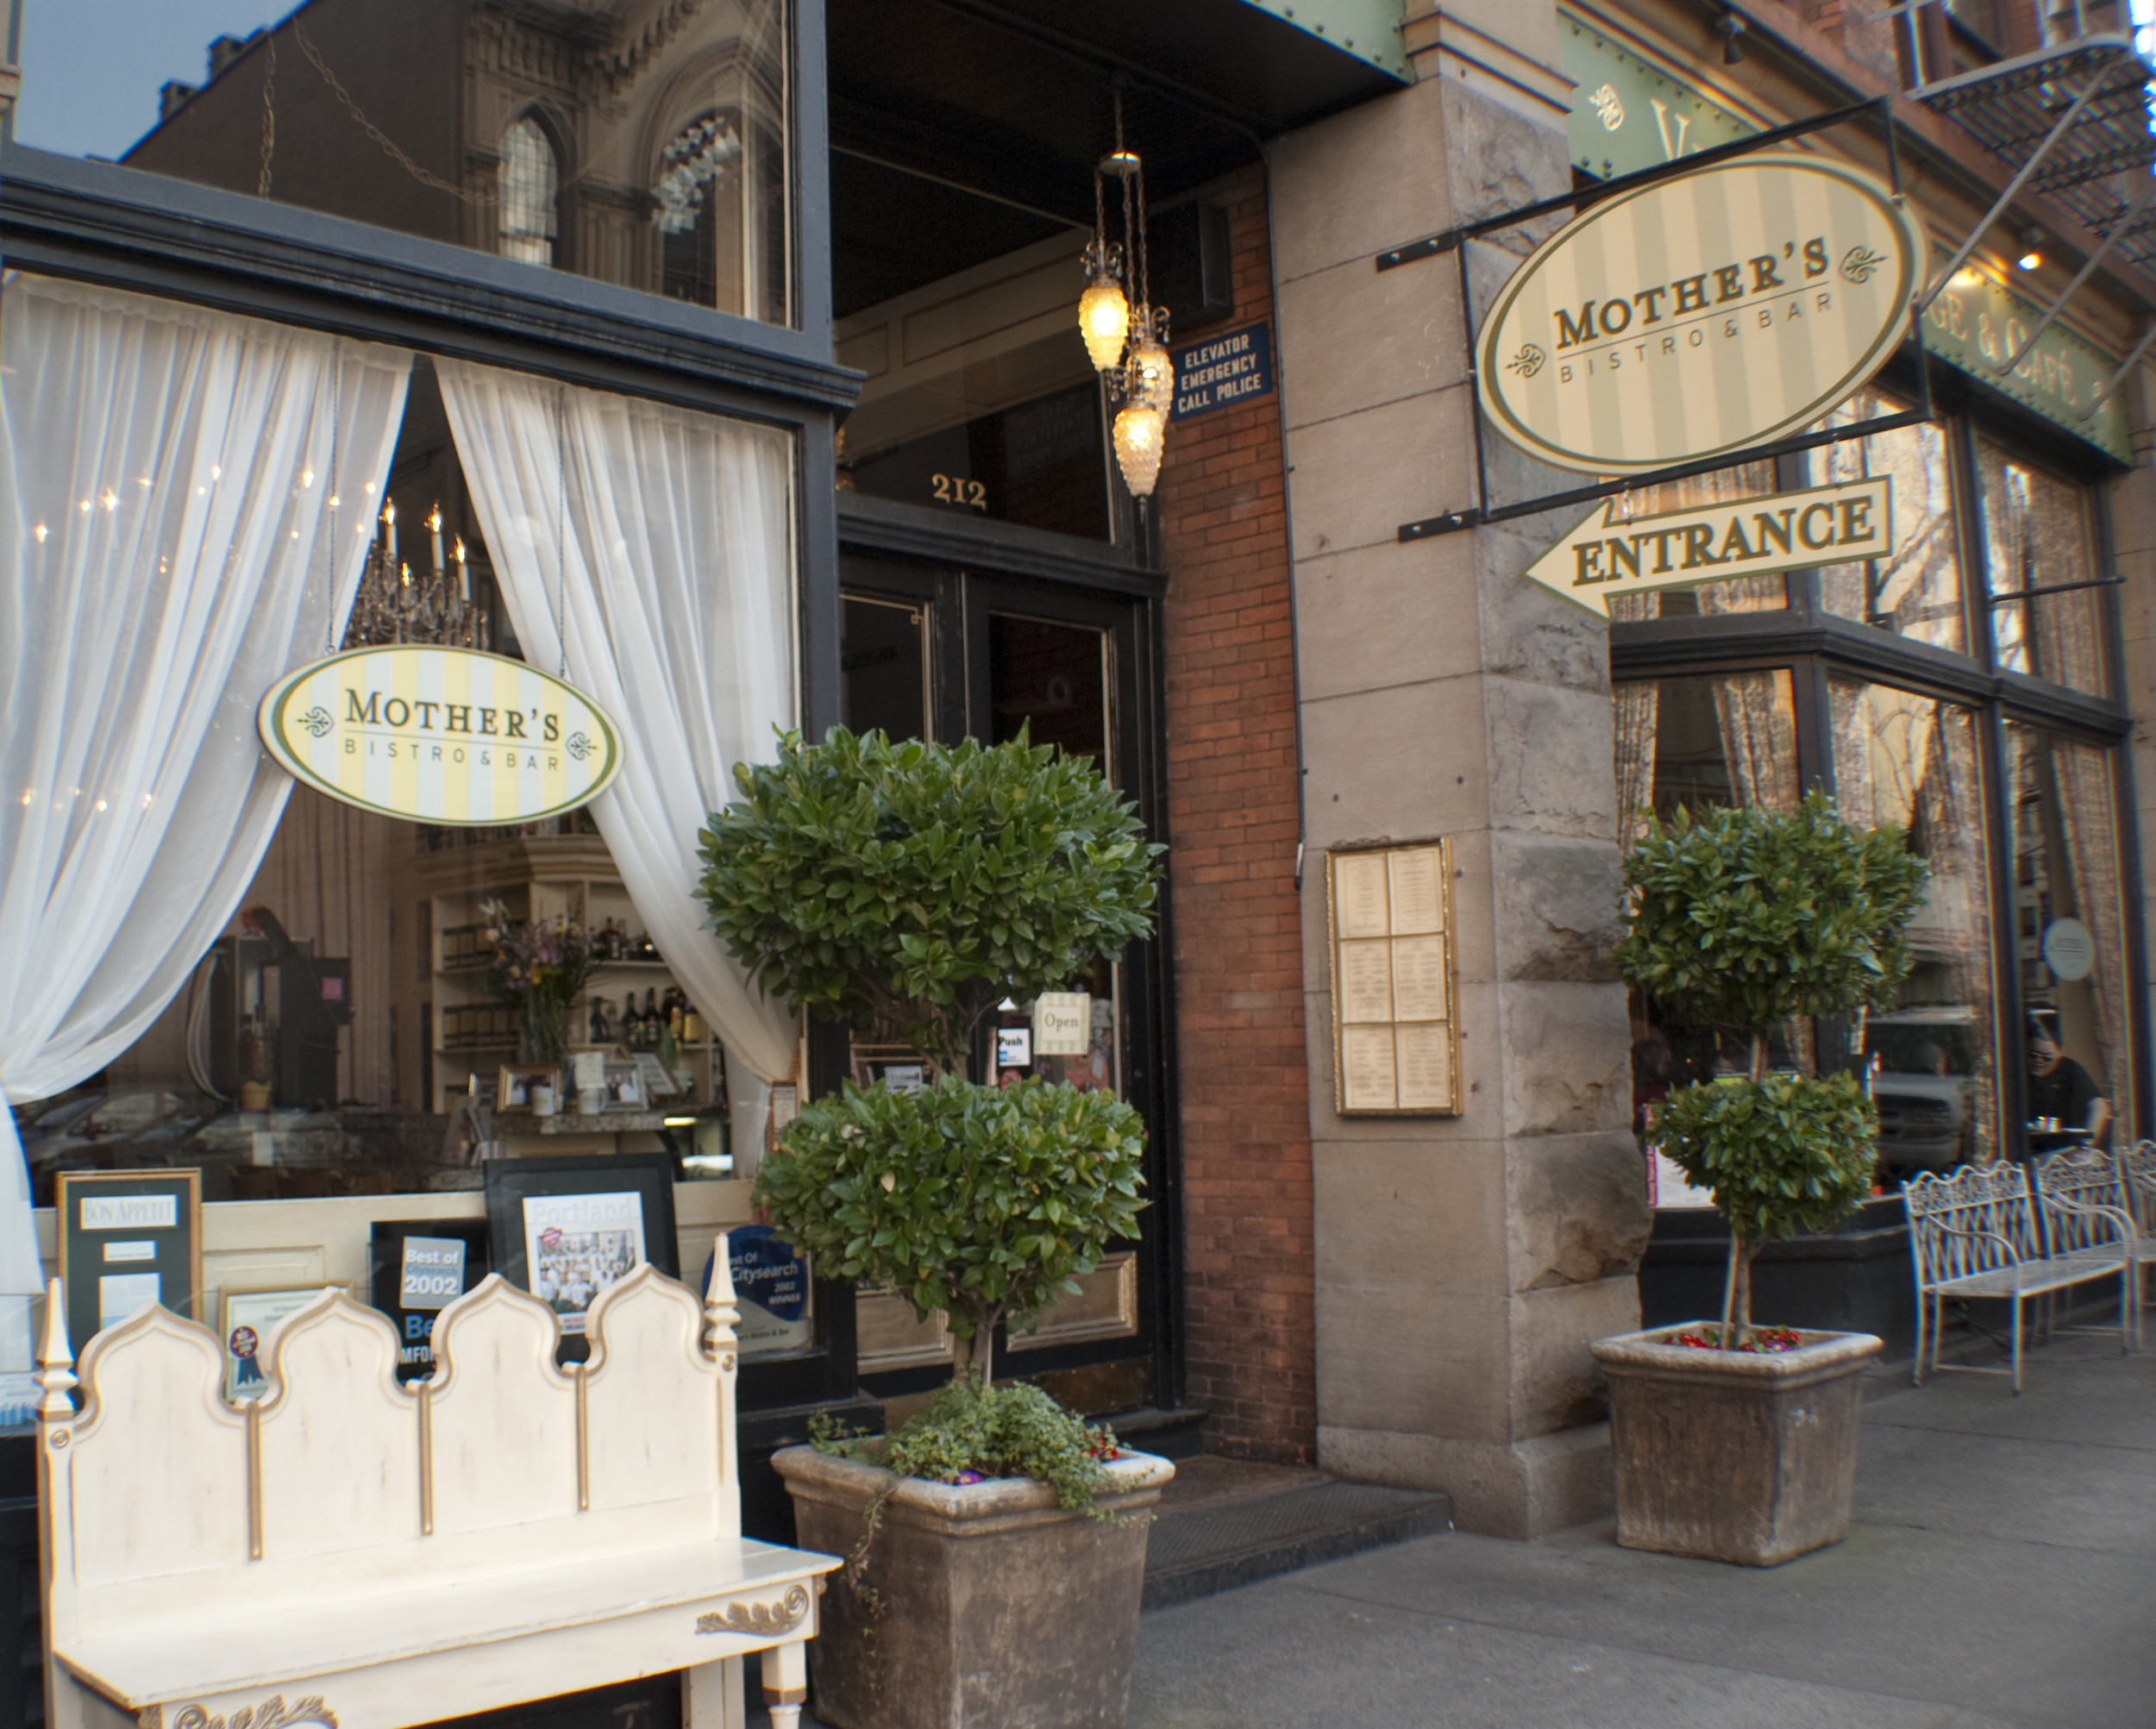 9/Mother's Bistro & Bar